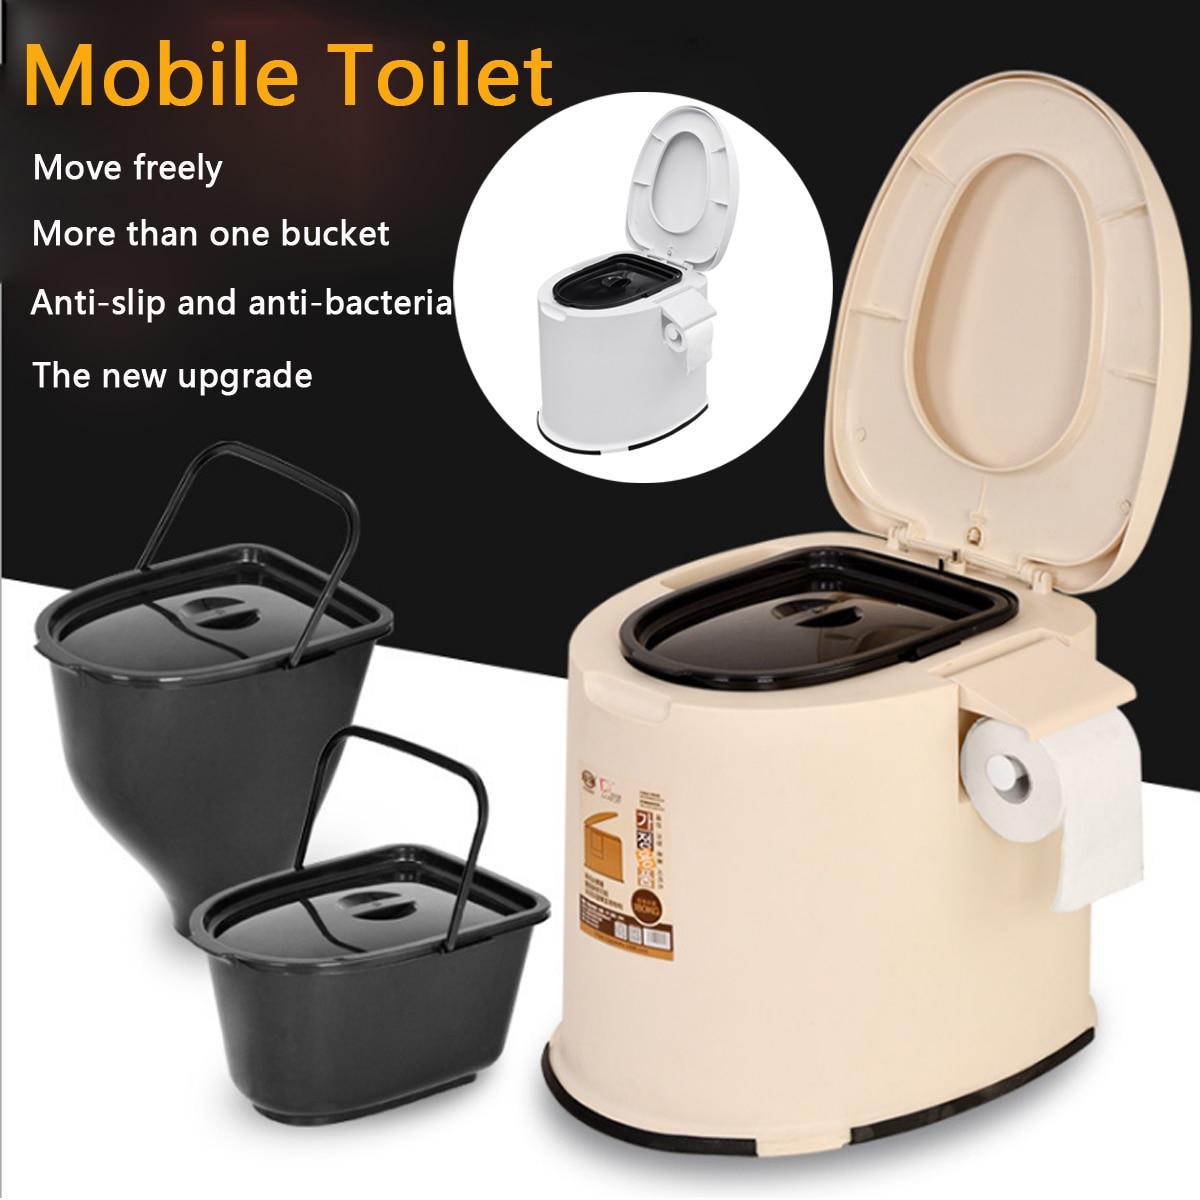 12L Capacità Comfort Portatile Cellulare Igienici Wc Viaggi di Campeggio Commode Vasino Outdoor/Indoor